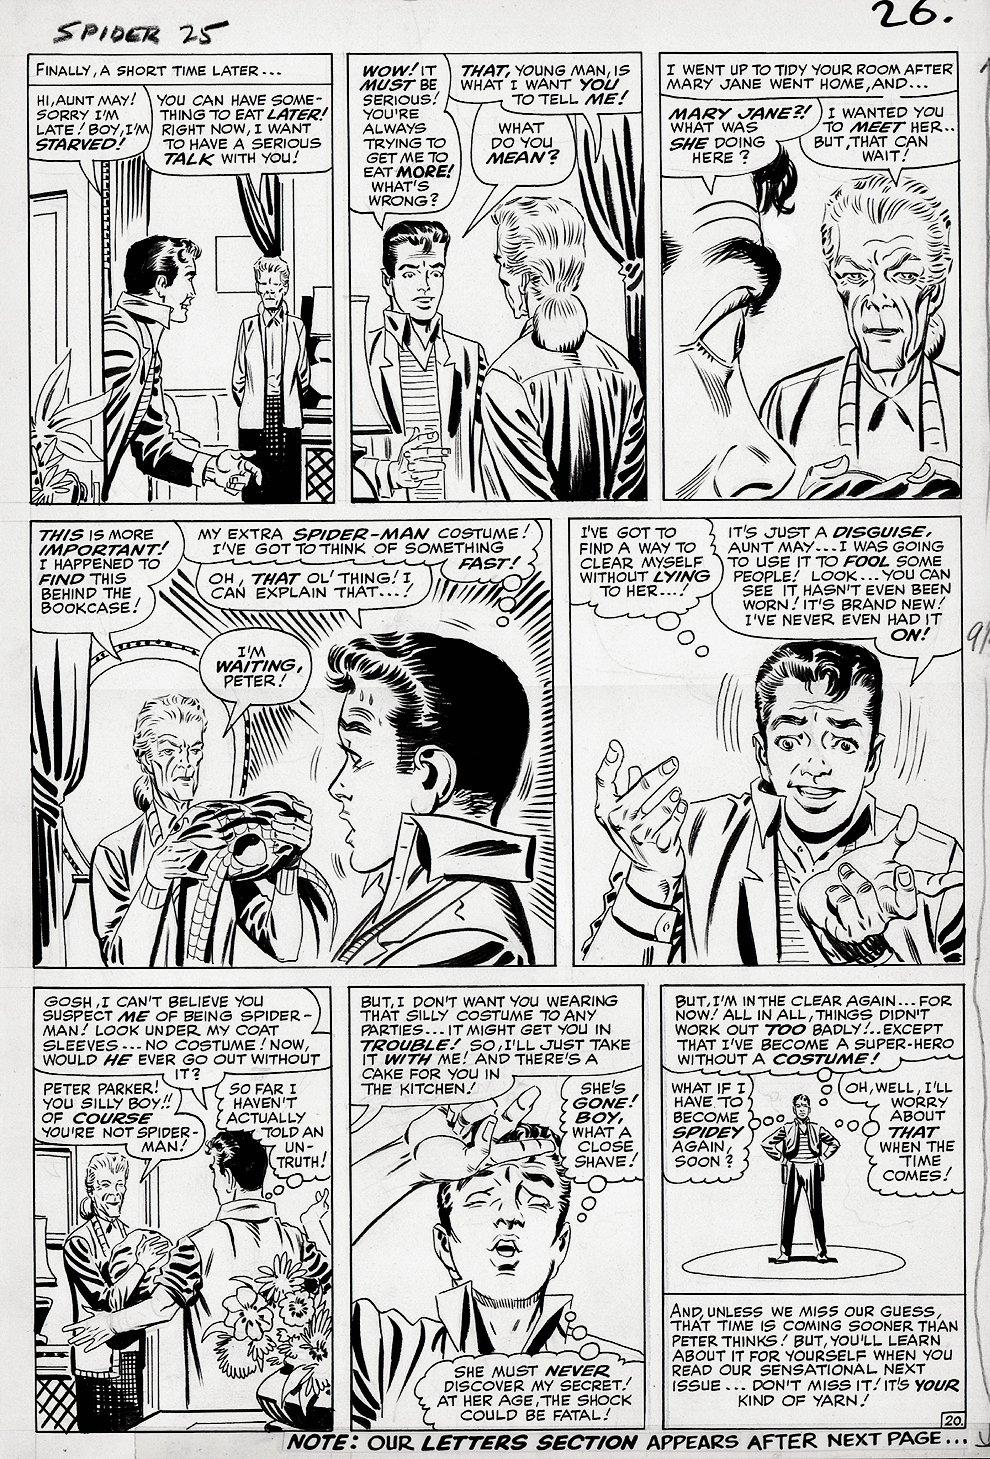 Amazing Spider-Man #25 p 20 (Large Art) 1964